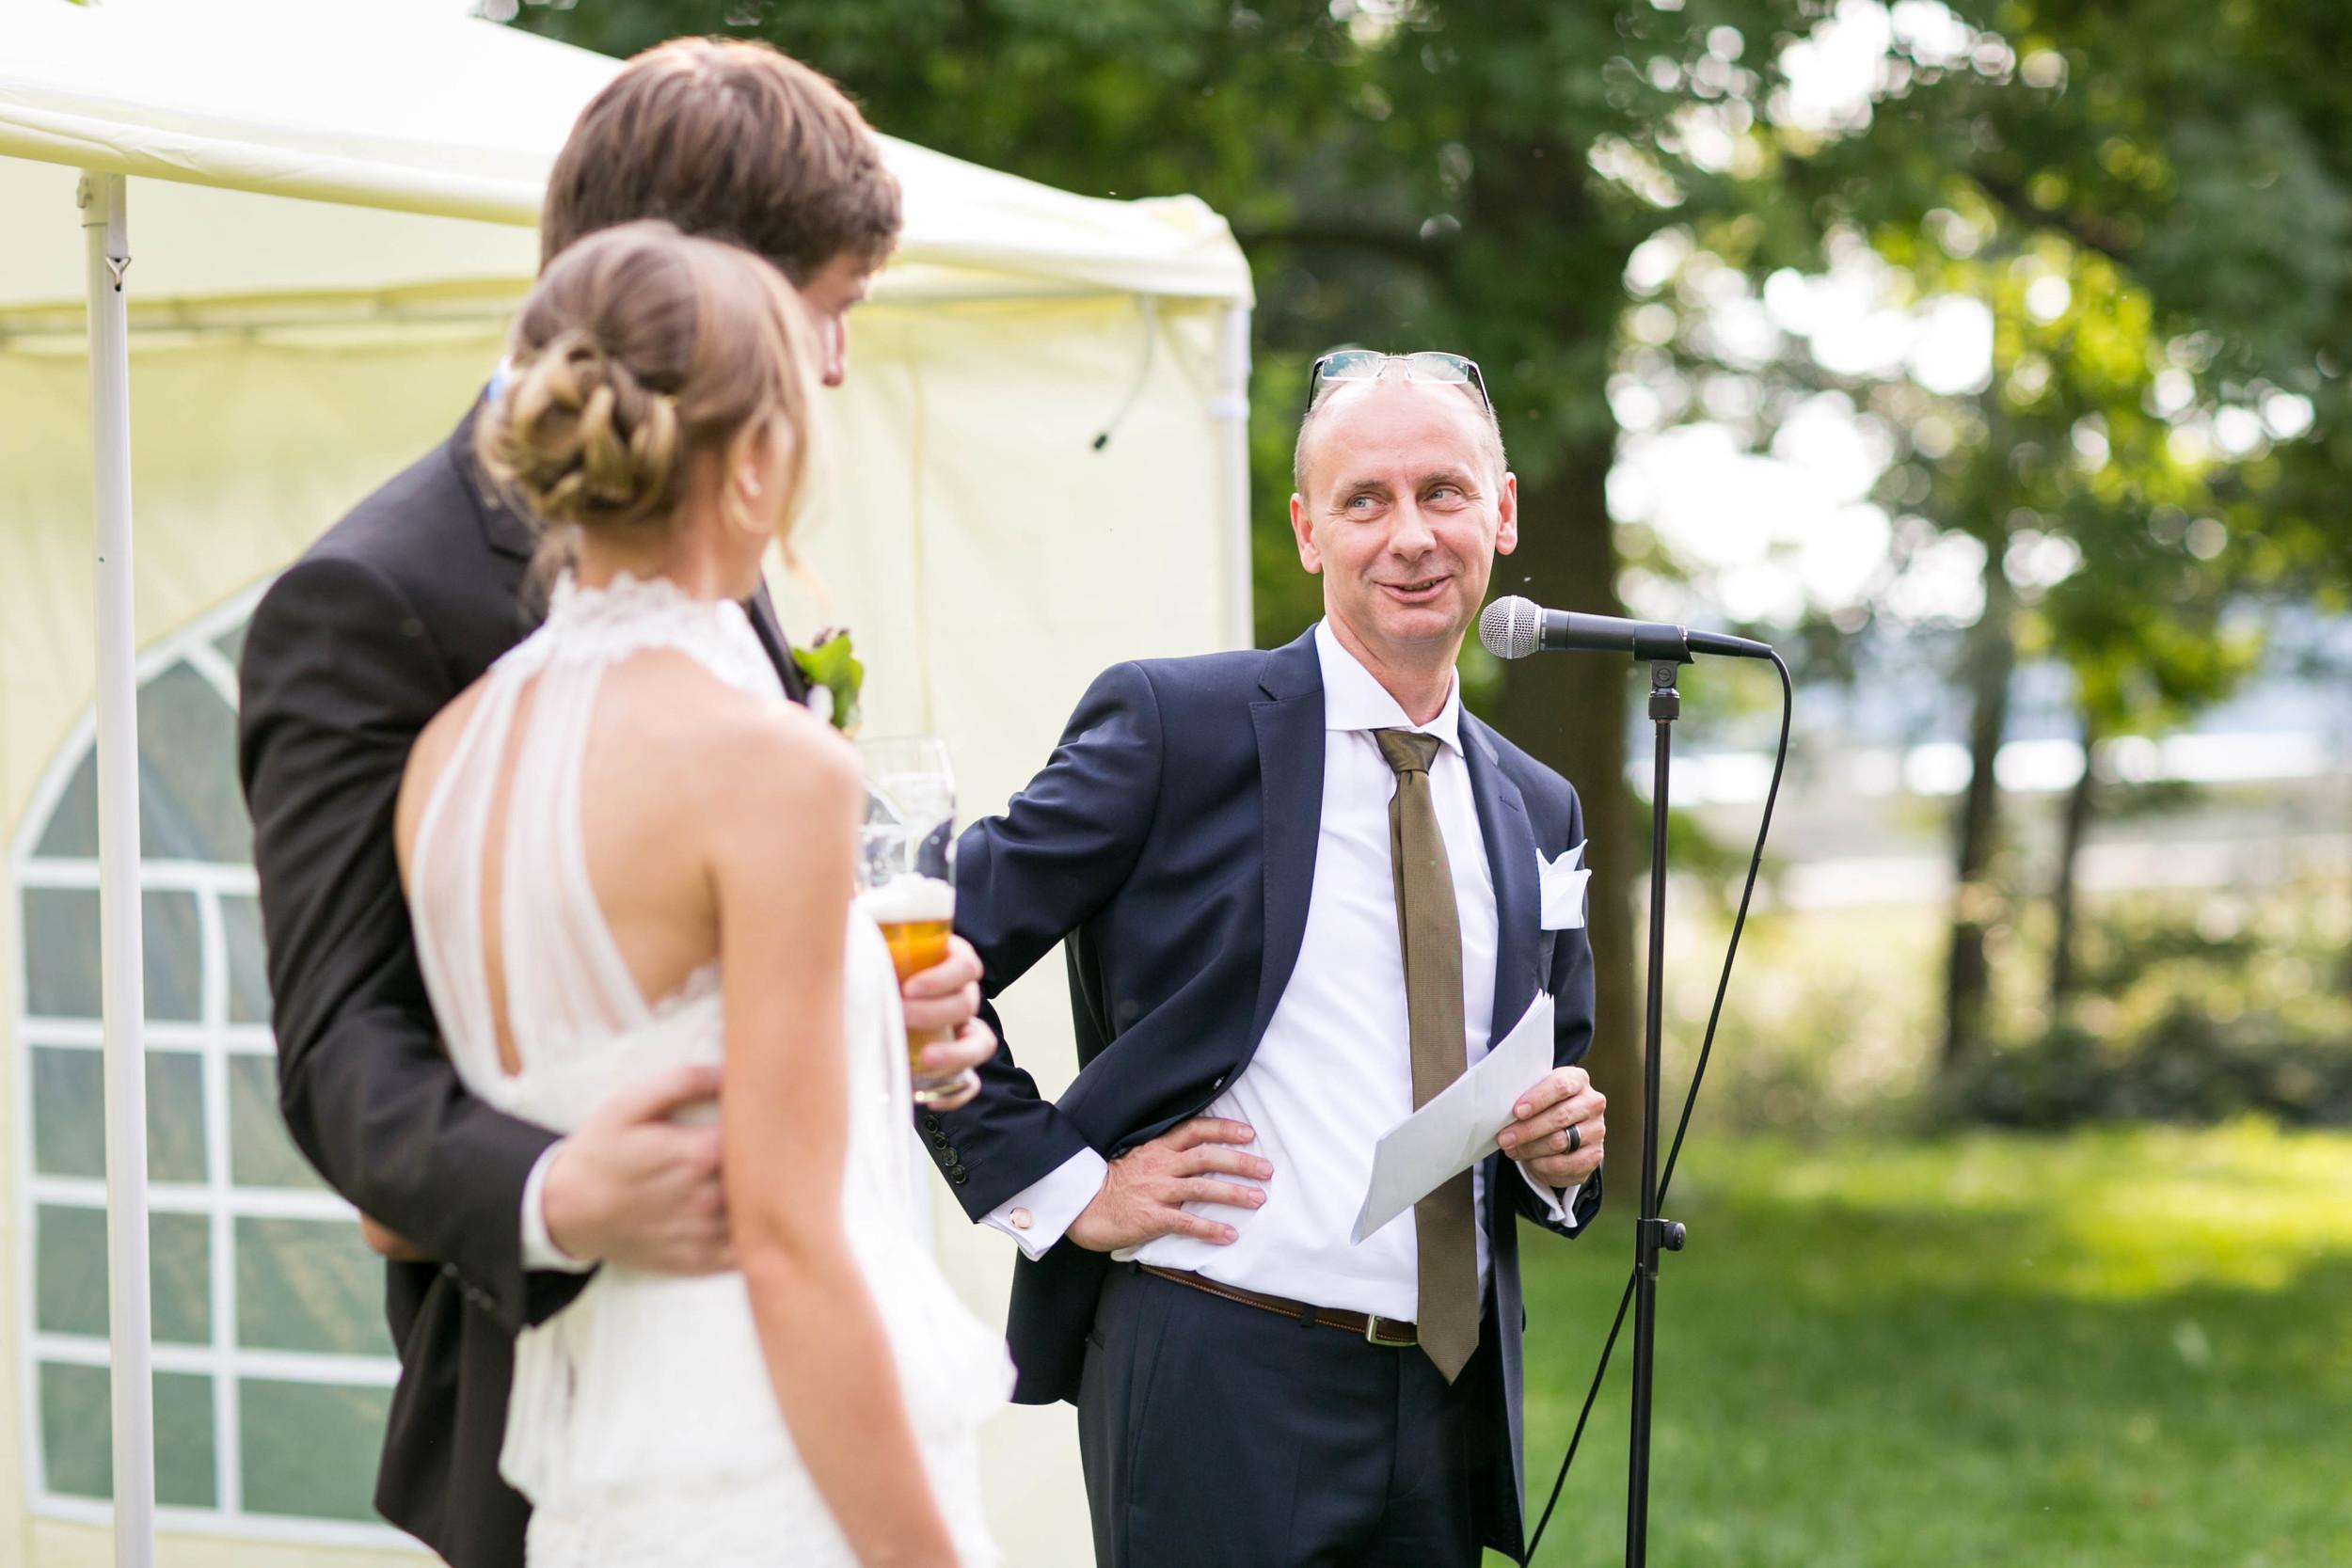 Fran Burrows Hochzeitsfotografie_Kulturgut Wrechen Hochzeit-52.jpg